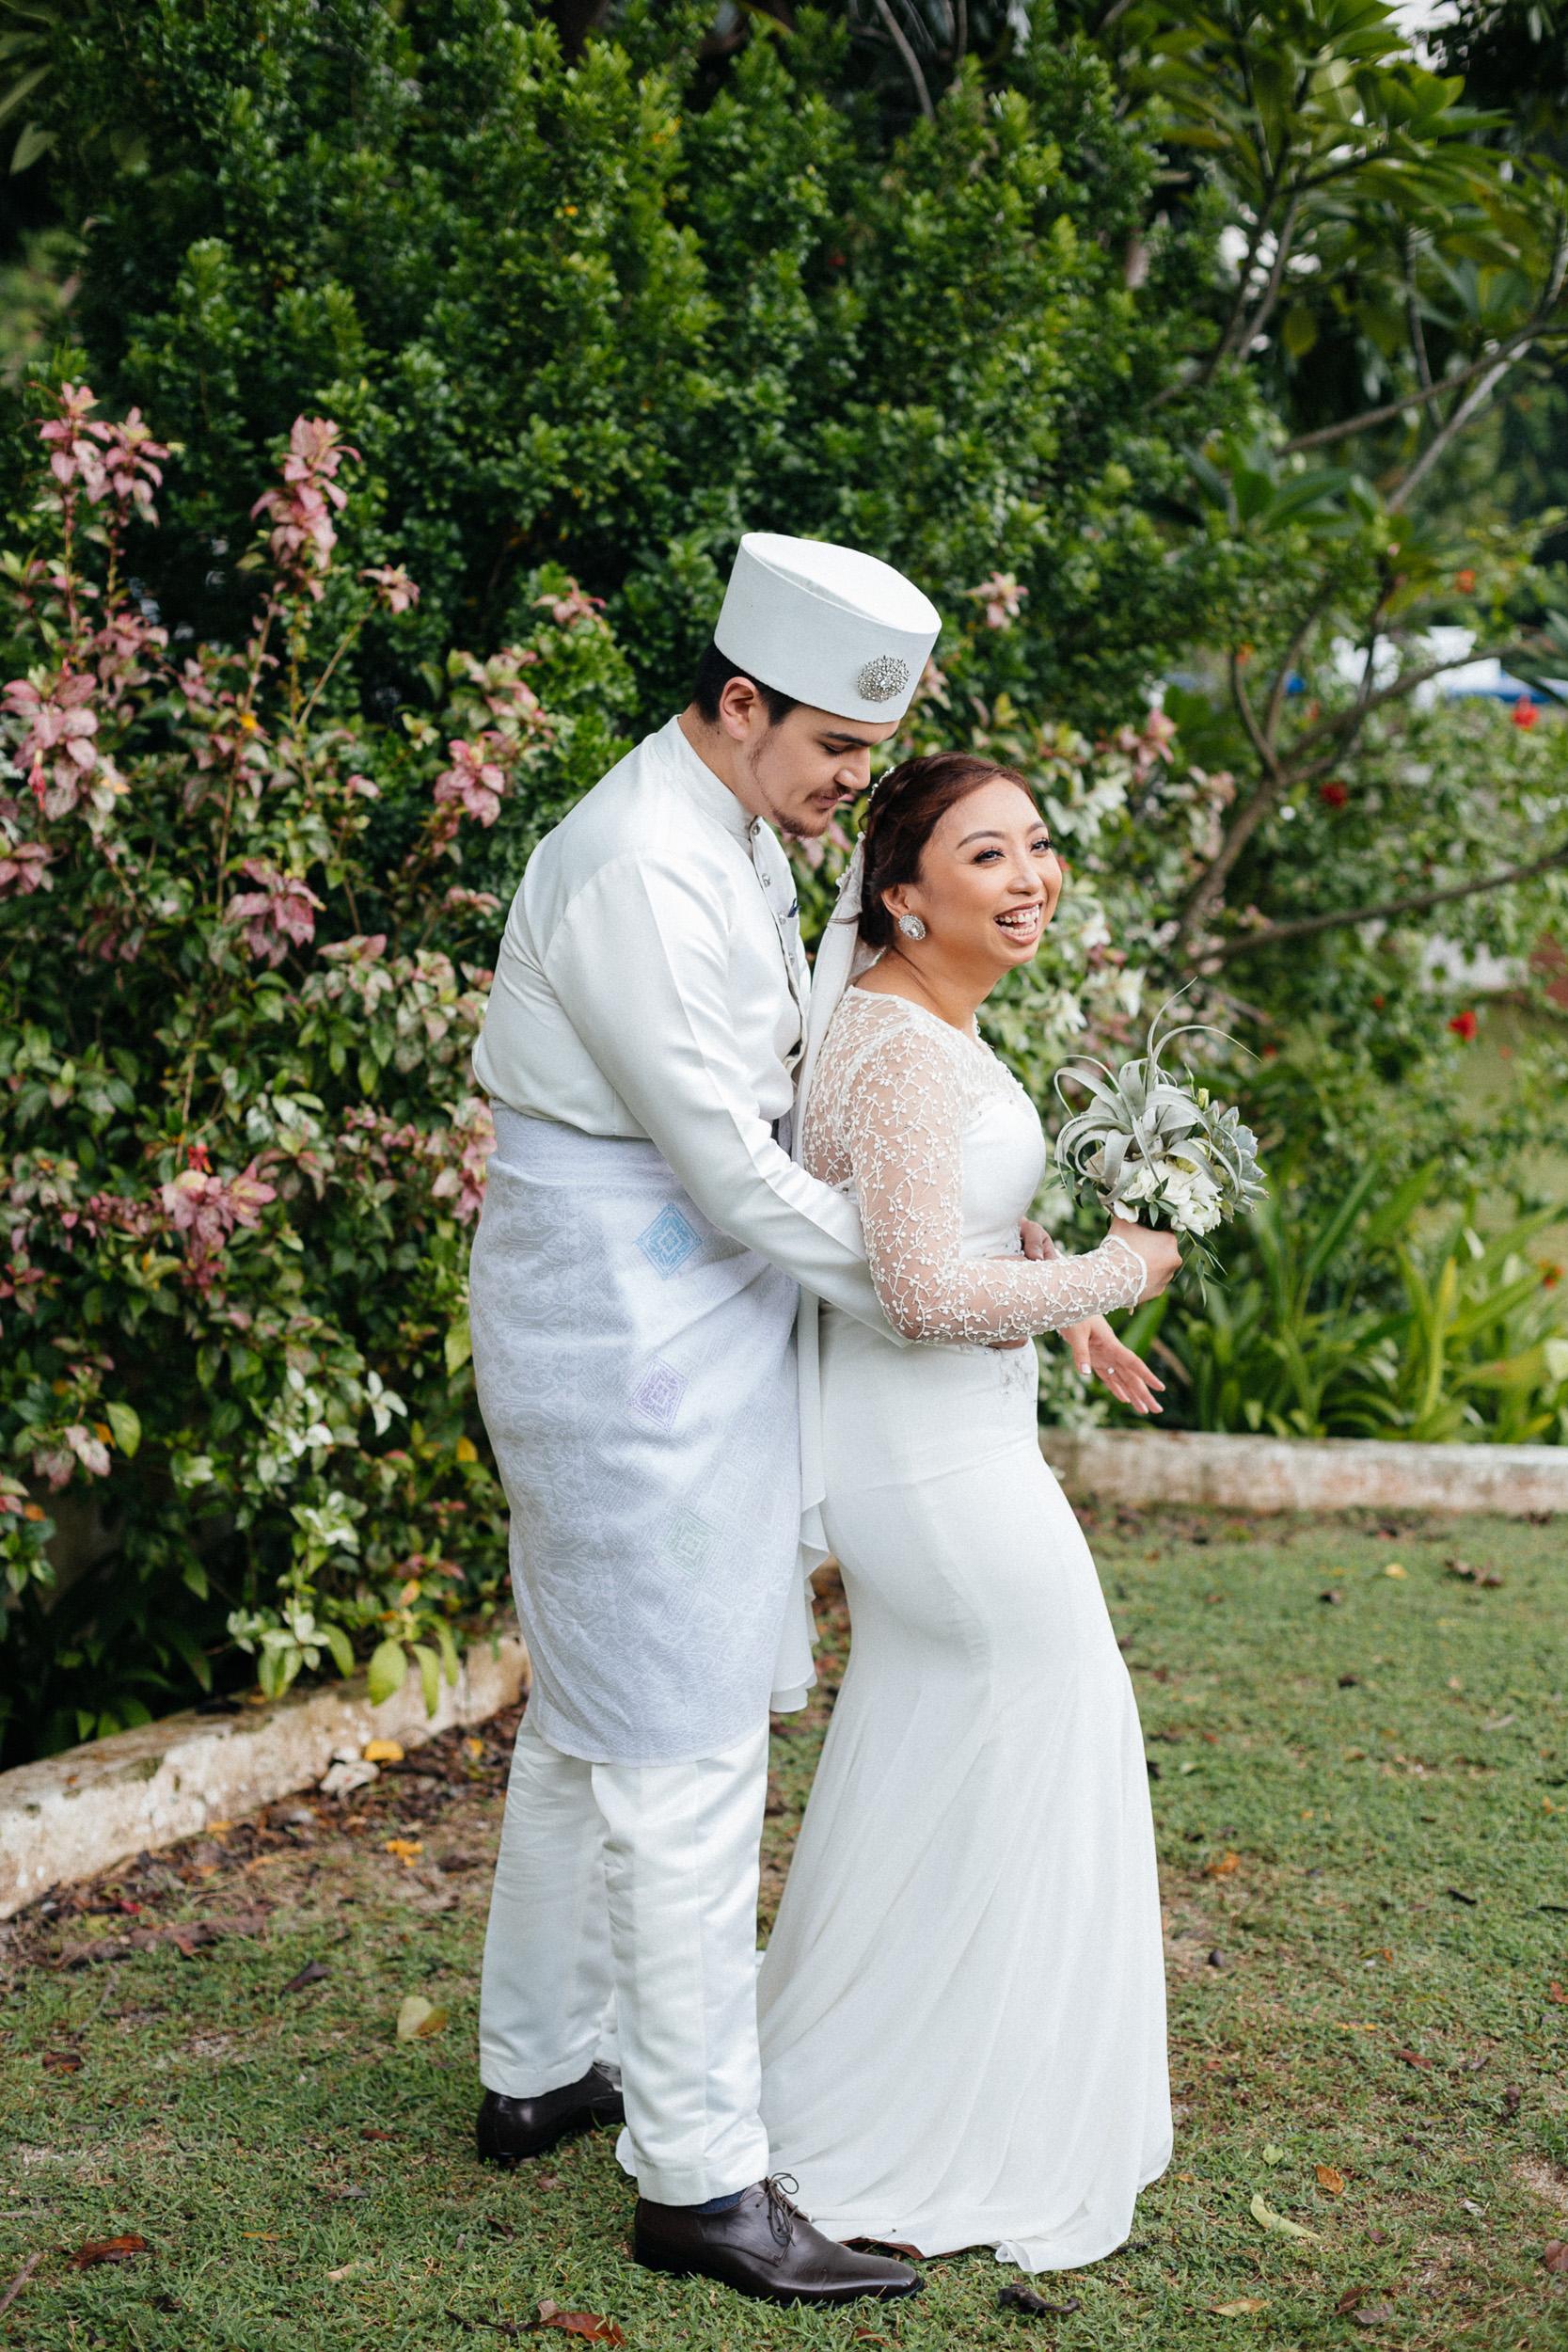 singapore-wedding-photographer-photography-wmt2017-115.jpg